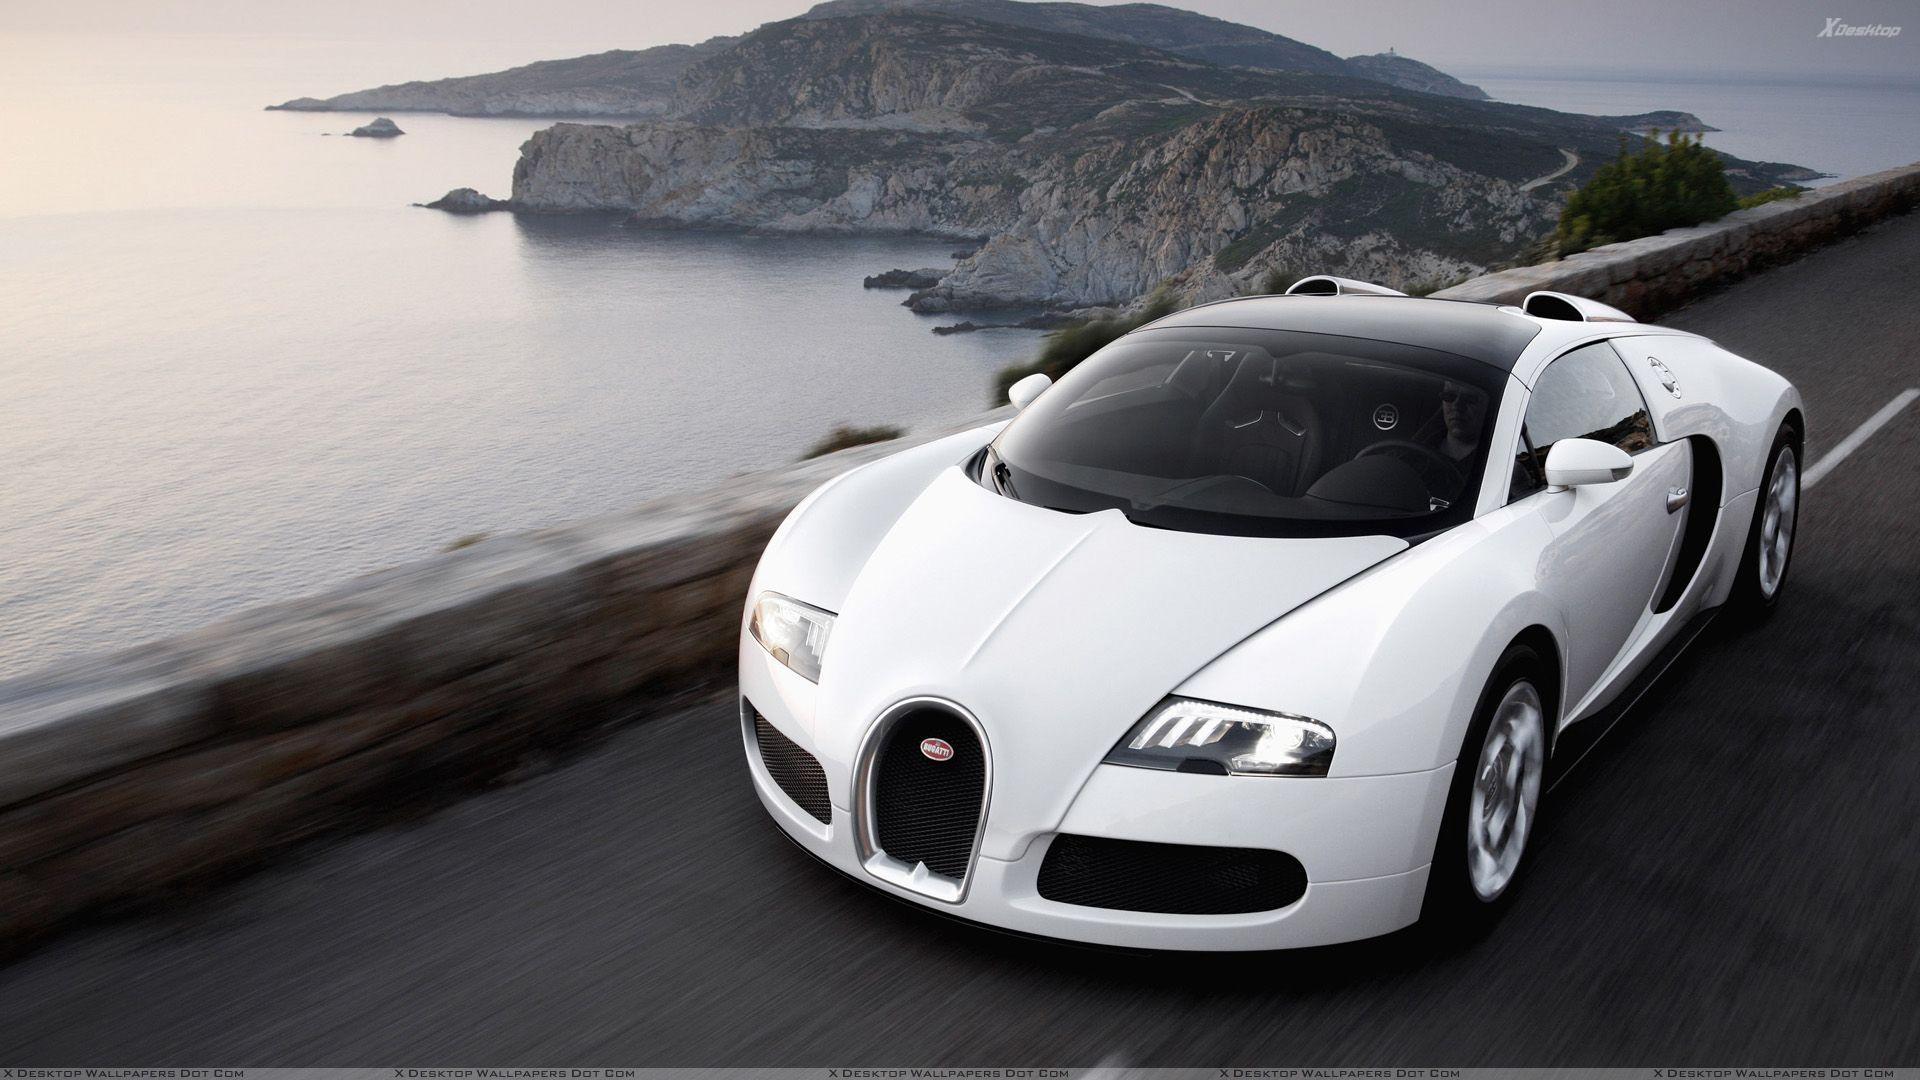 1c06dcd874b0e3b6a60437a98697823f Stunning Bugatti Veyron Super Sport White Cars Trend